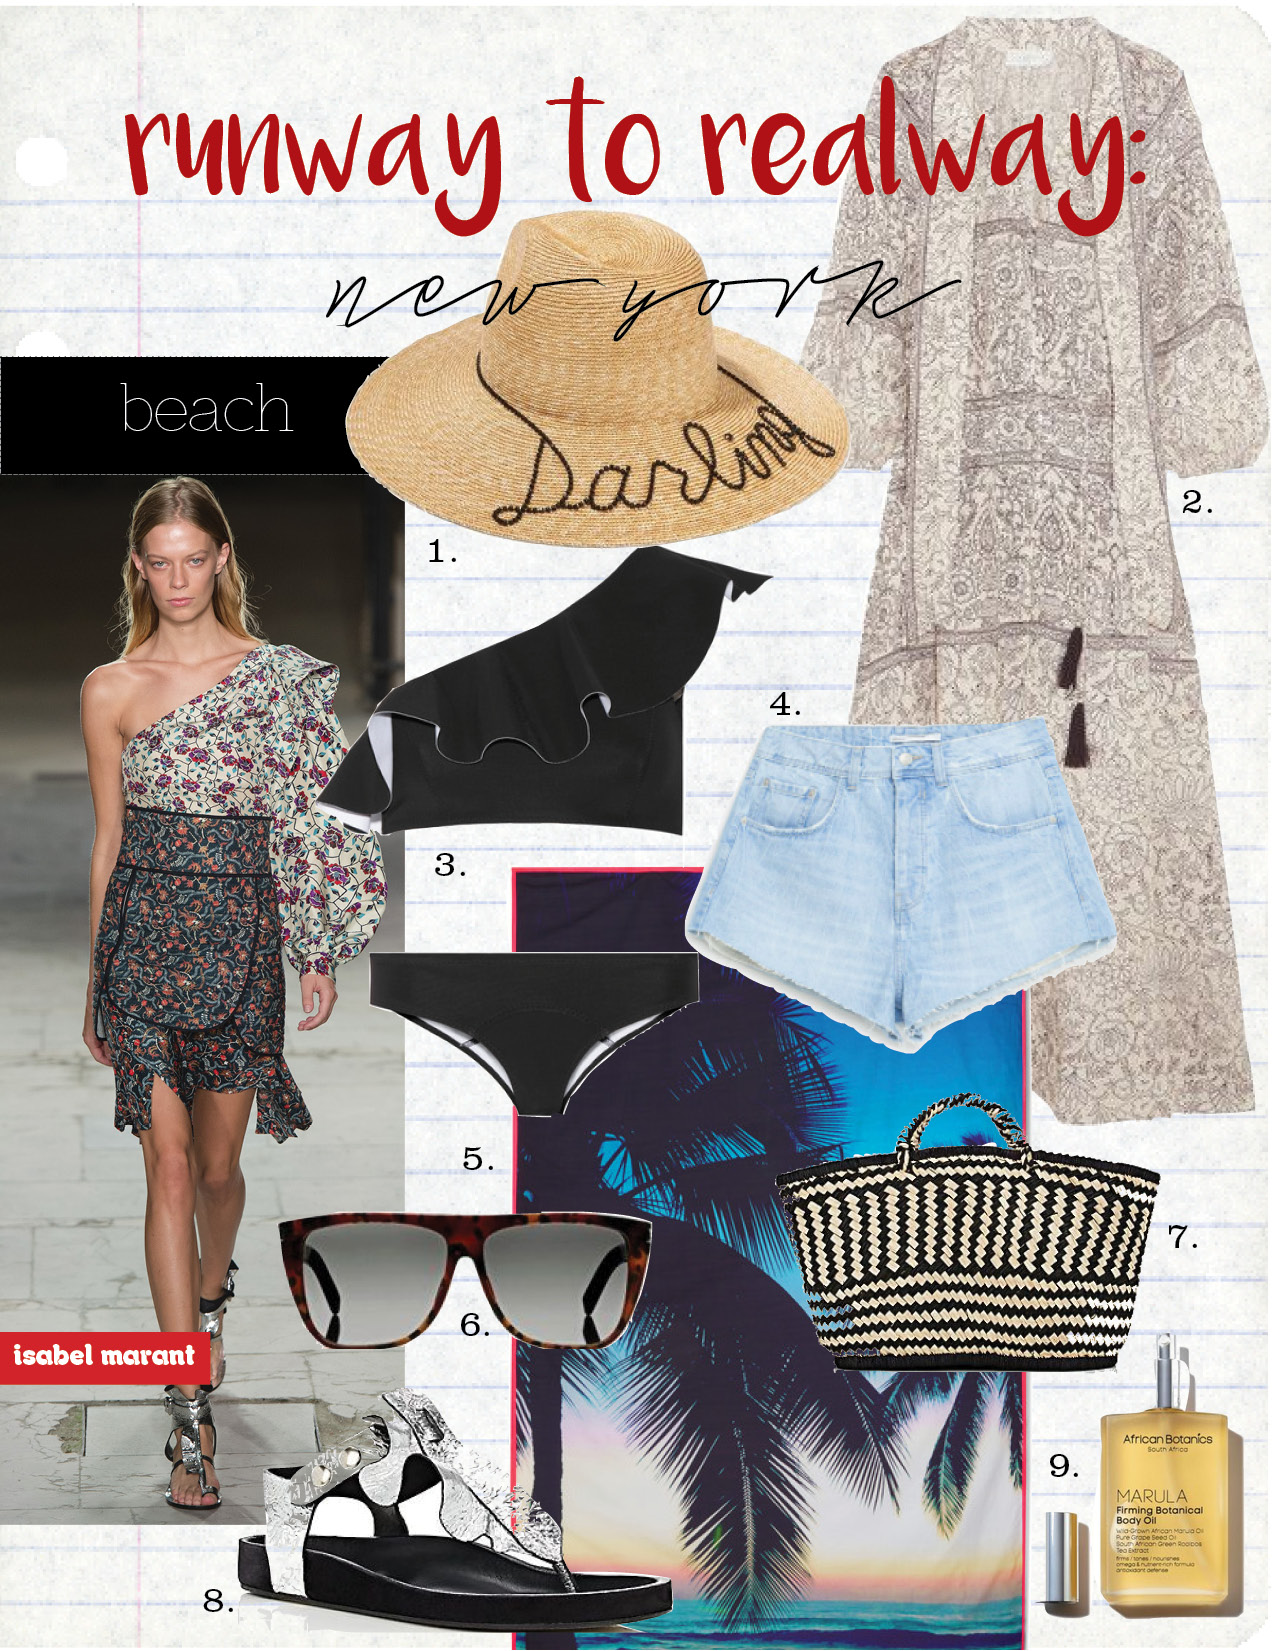 "1. eugenia kim emmanuelle crystal-emmished straw hat, $465,  net-a-porter.com  2. zimmerman caravan pussy-bow printed linen dress, $580,  net-a-porter.com  3. lisa marie fernandez arden one-shoulder bonded bikini, $395,  net-a-porter.com  4. zara high rise denim shorts, $29,  zara.com  5. samudra makaha printed cotton-poplin beach blanket, $63,  net-a-porter.com  6. saint laurent sl 1 sunglasses tortoiseshell, $360,  barneys.com  7. soeur vienne basket bag, $95,  barneys.com  8. isabel marant ""leakey"" metallic leather t-strap sandals, $505,  barneys.com  9. marula firming botanical body oil, $90,  violetgrey.com"